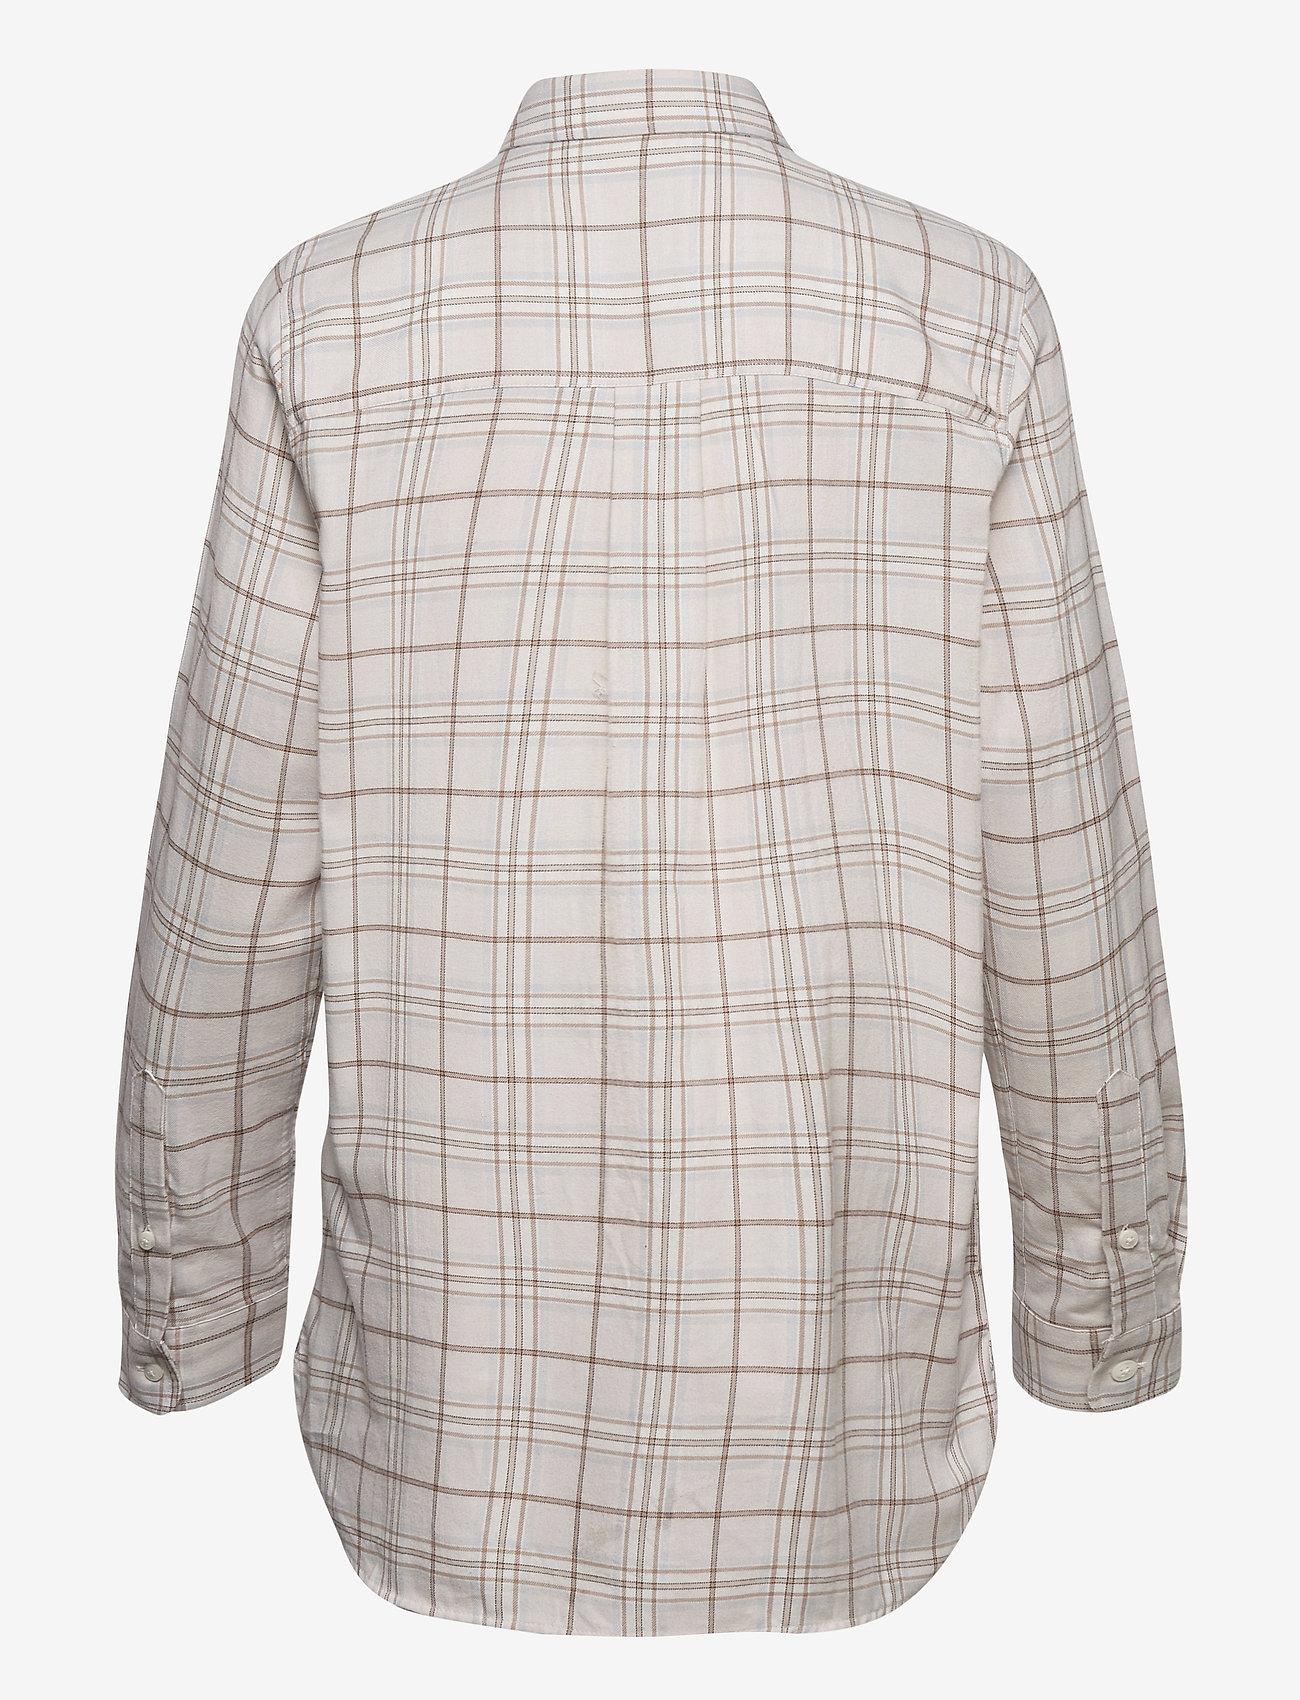 Isa Check Organic Cotton Flannel Shirt   - Lexington Clothing -  Women's Blouses & Shirts Manchester